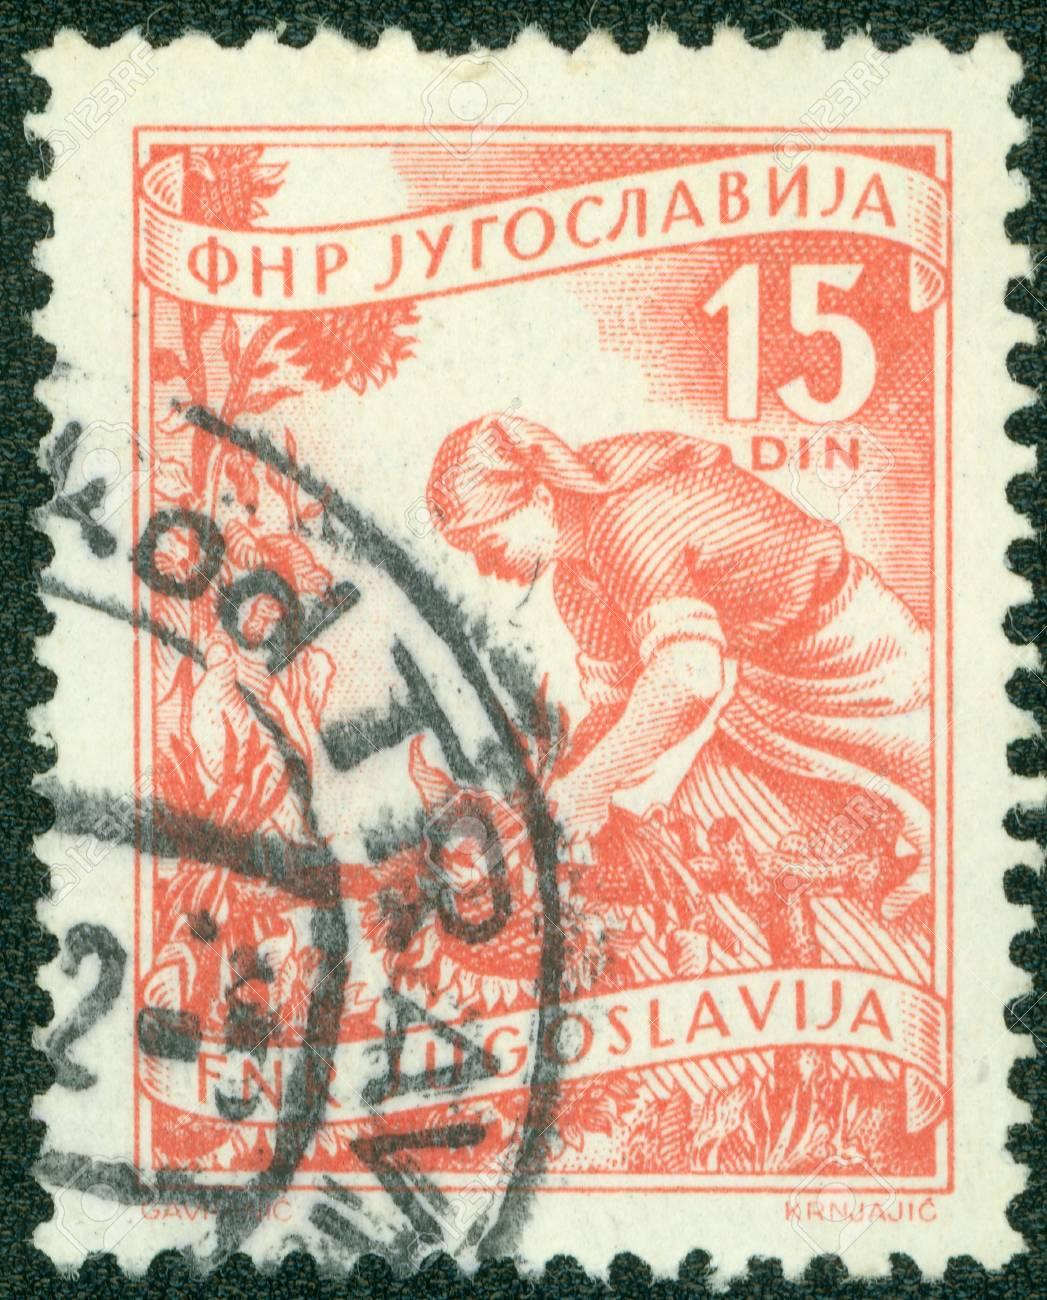 YUGOSLAVIA - CIRCA 1950  A stamp printed in Yugoslavia shows woman picking sunflowers, circa 1950 Stock Photo - 16043027